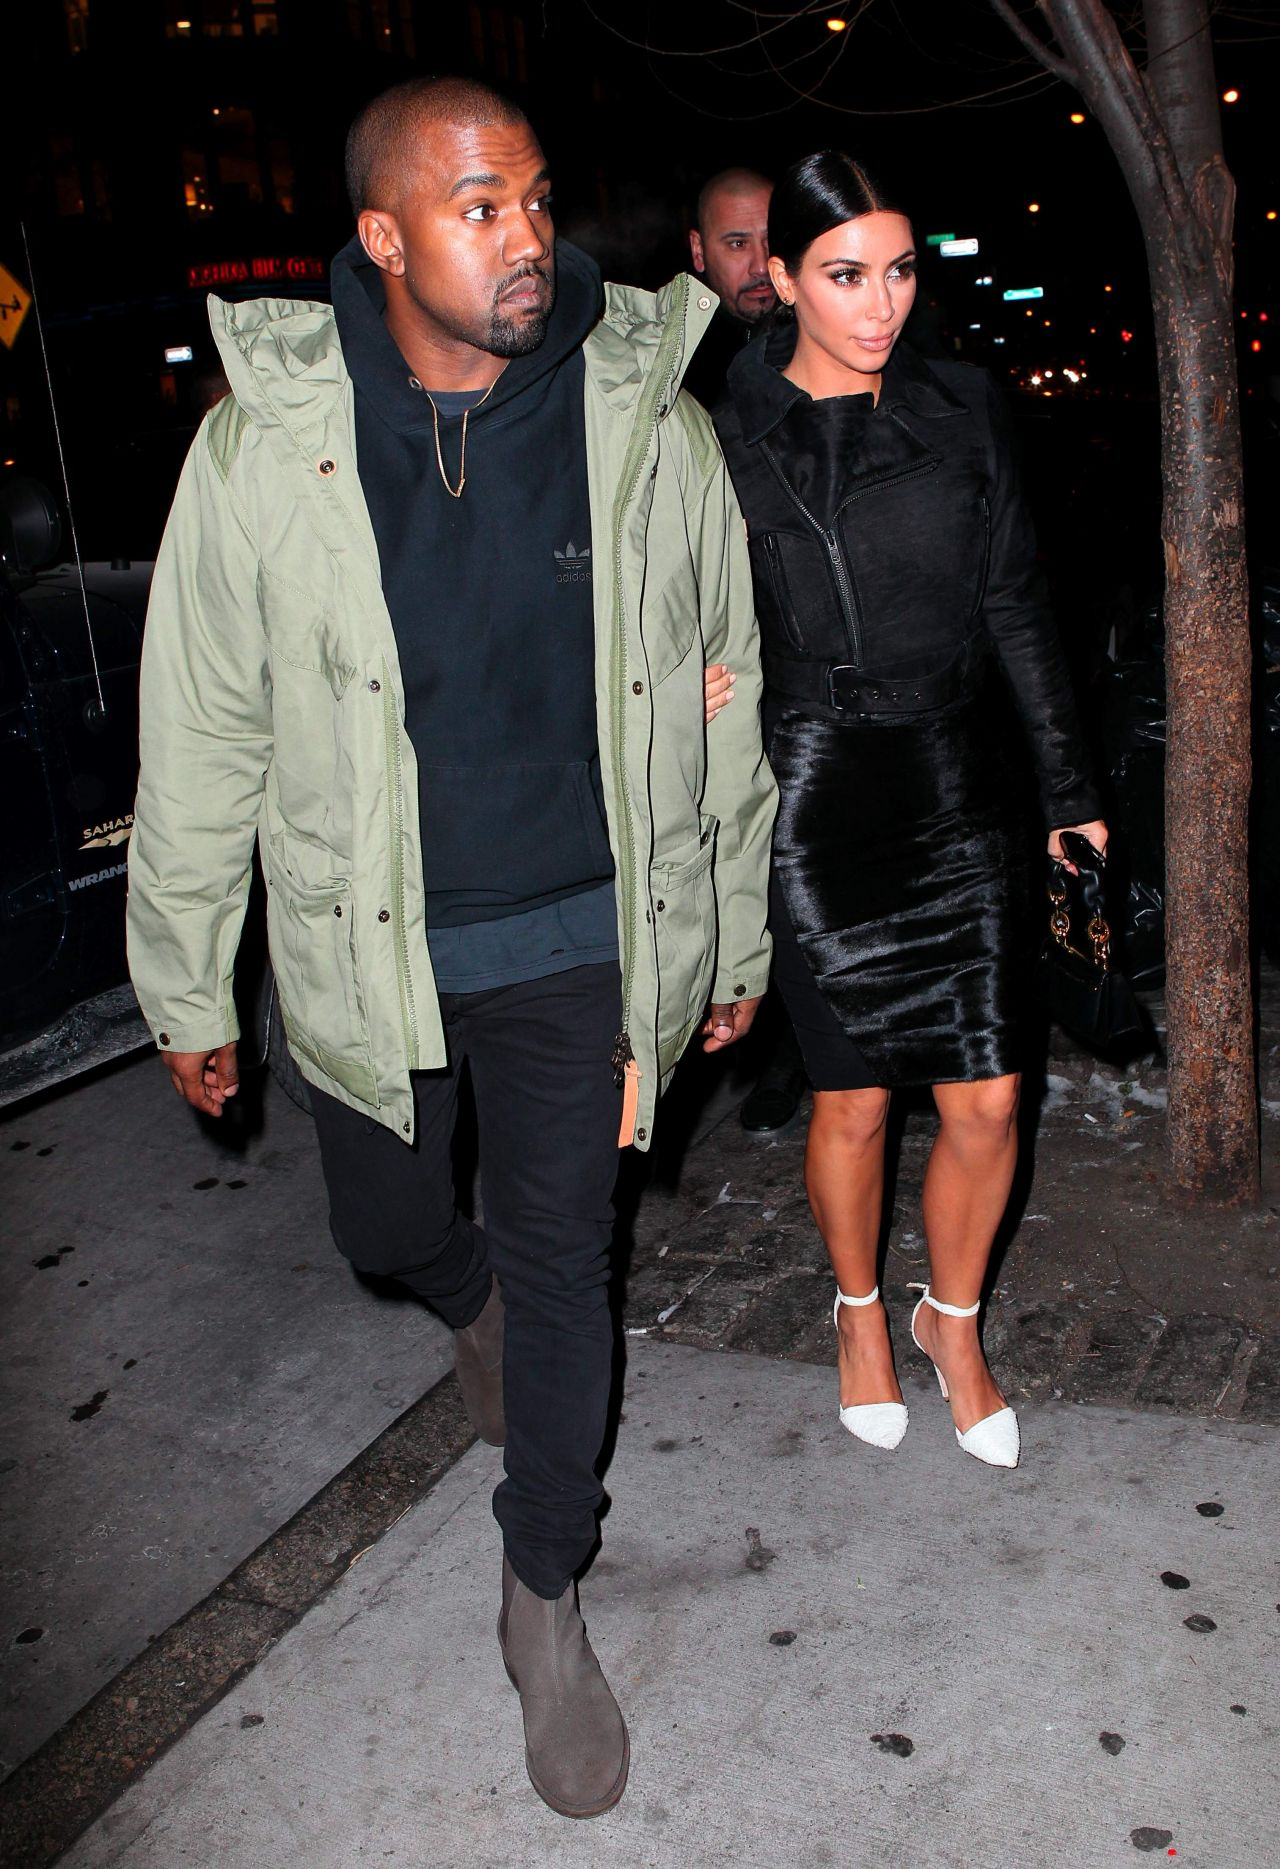 Kim Kardashian 2015 Celebrity Photos Style Out In New York City January Page 1